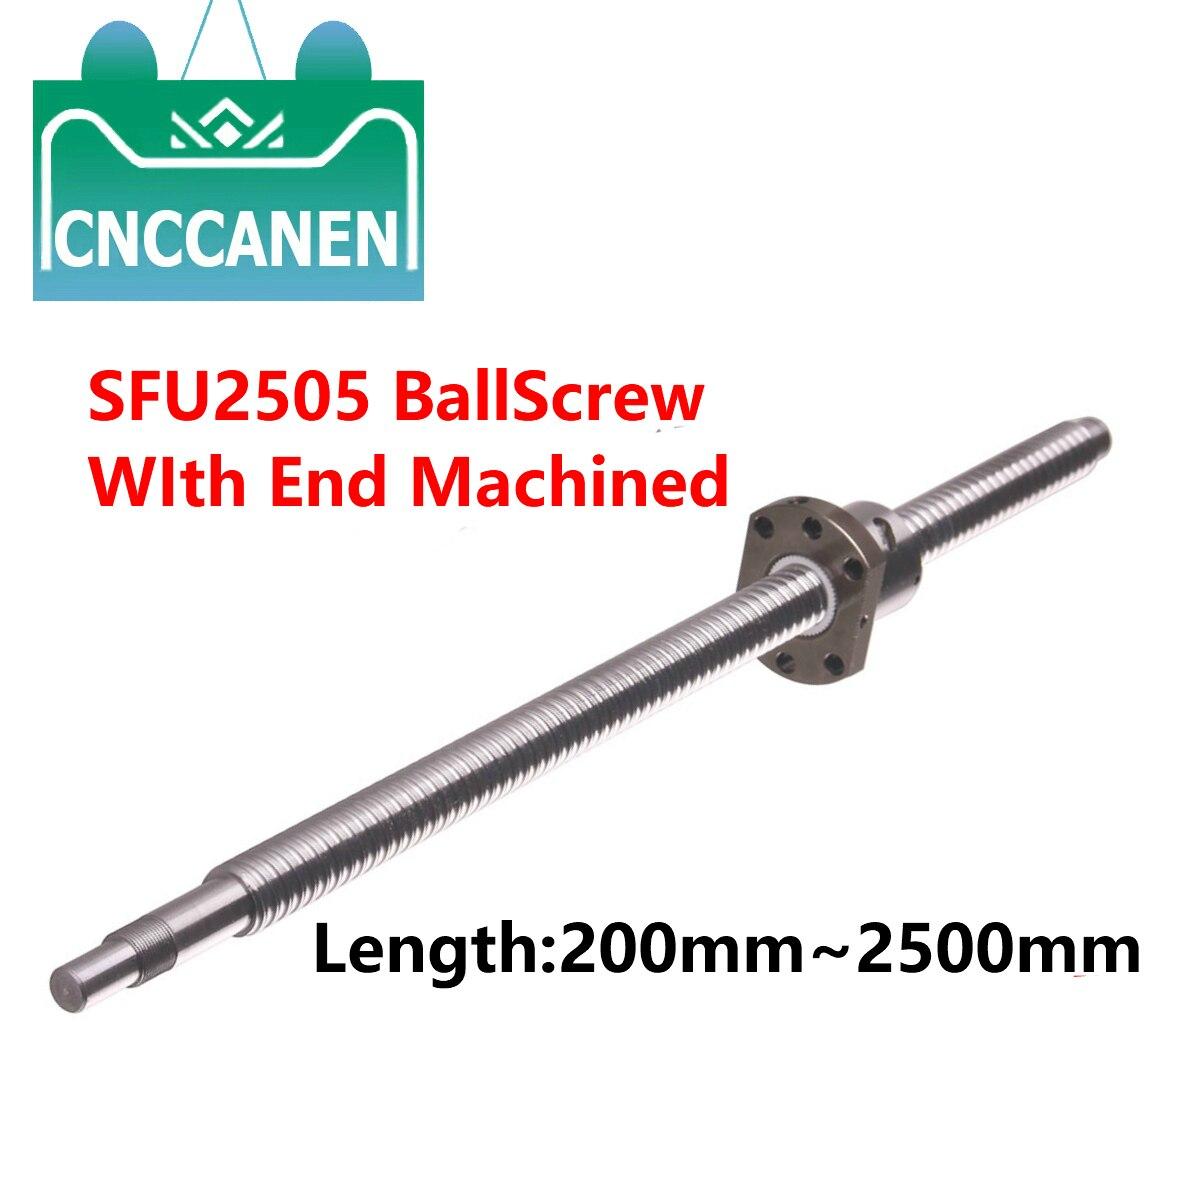 RM2505 BallScrew SFU2505-300 1000 1500 2000 2500 مللي متر الكرة المسمار C7 مع شفة واحدة الكرة الجوز BK/BF20 نهاية تشكيله ل CNC أجزاء